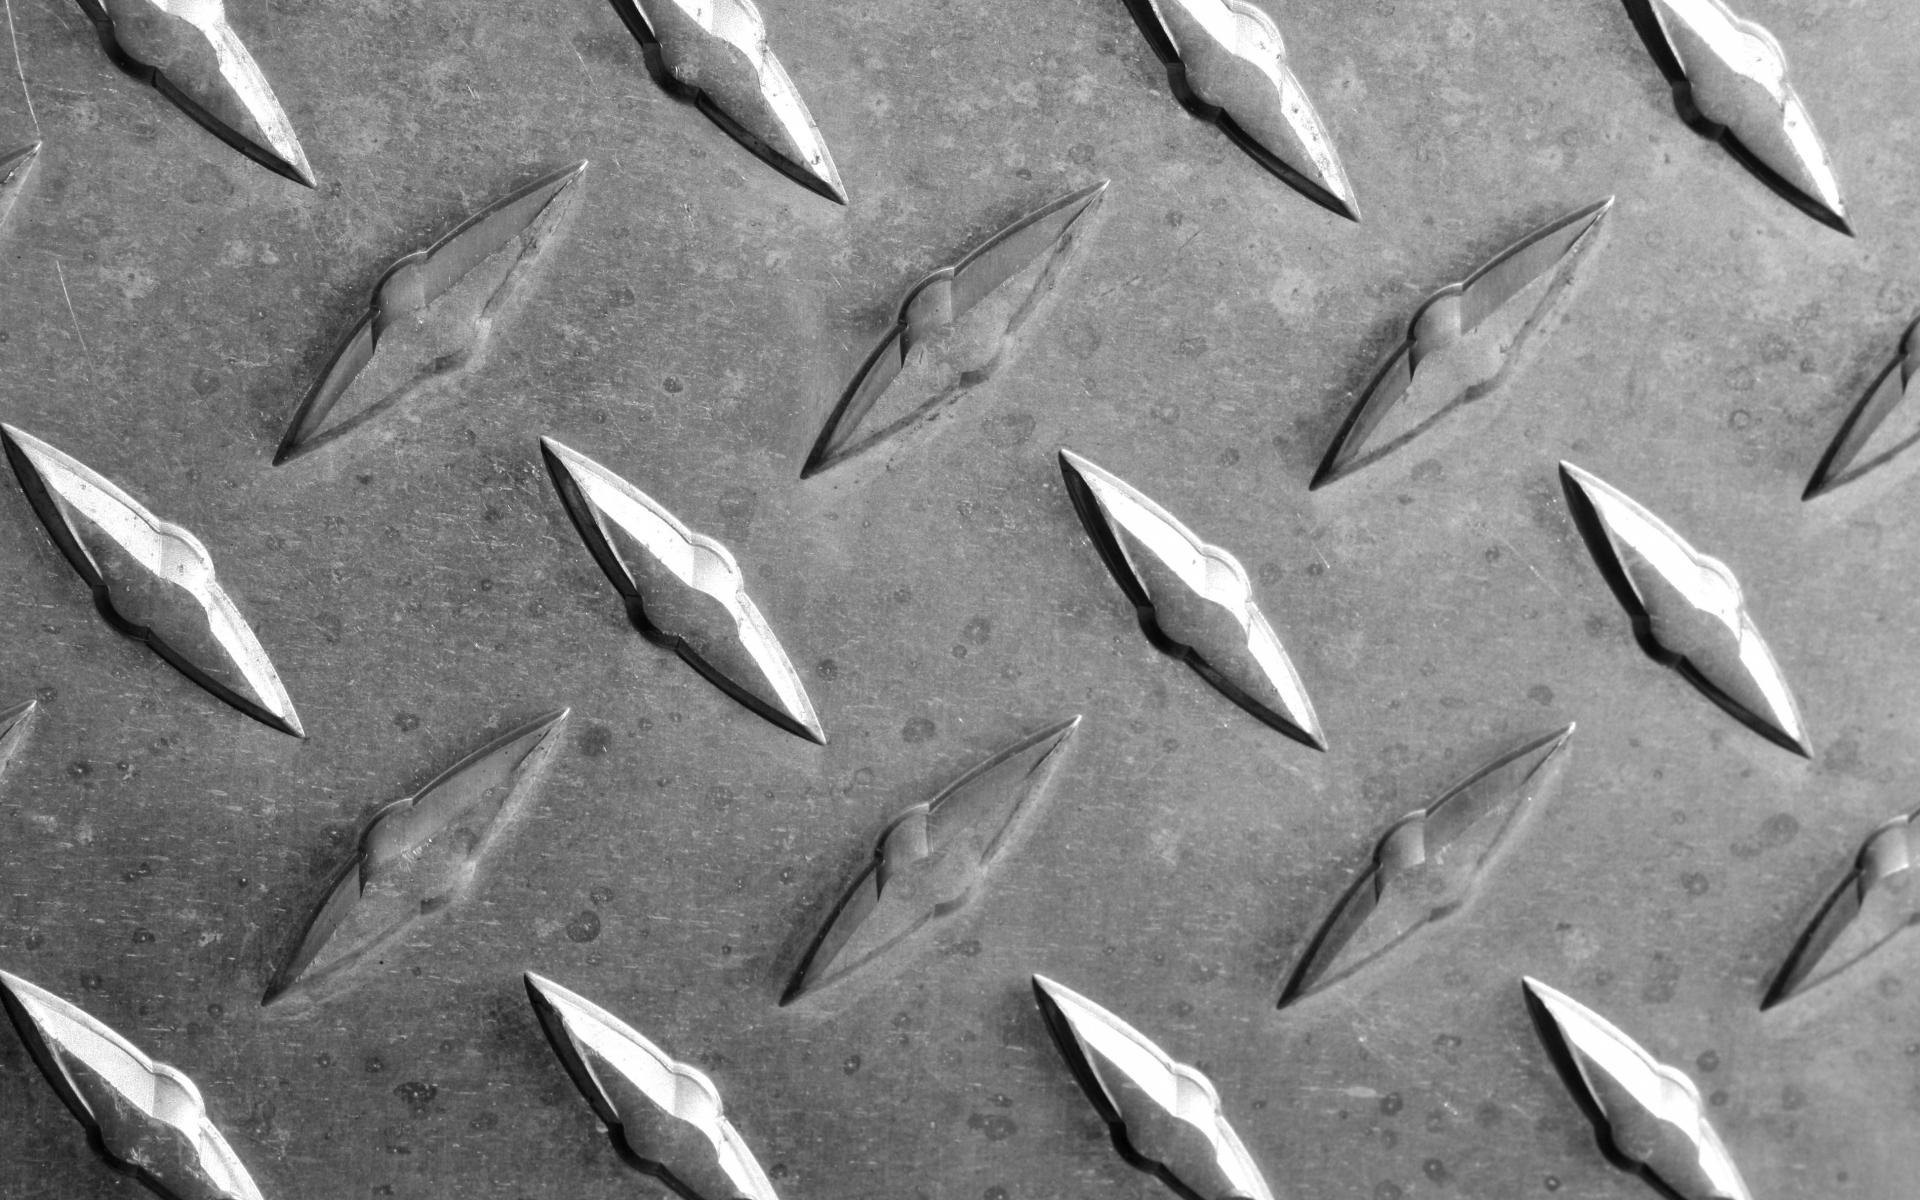 diamond plate 3888x2592 wallpaper Wallpaper Wallpapers 1920x1200